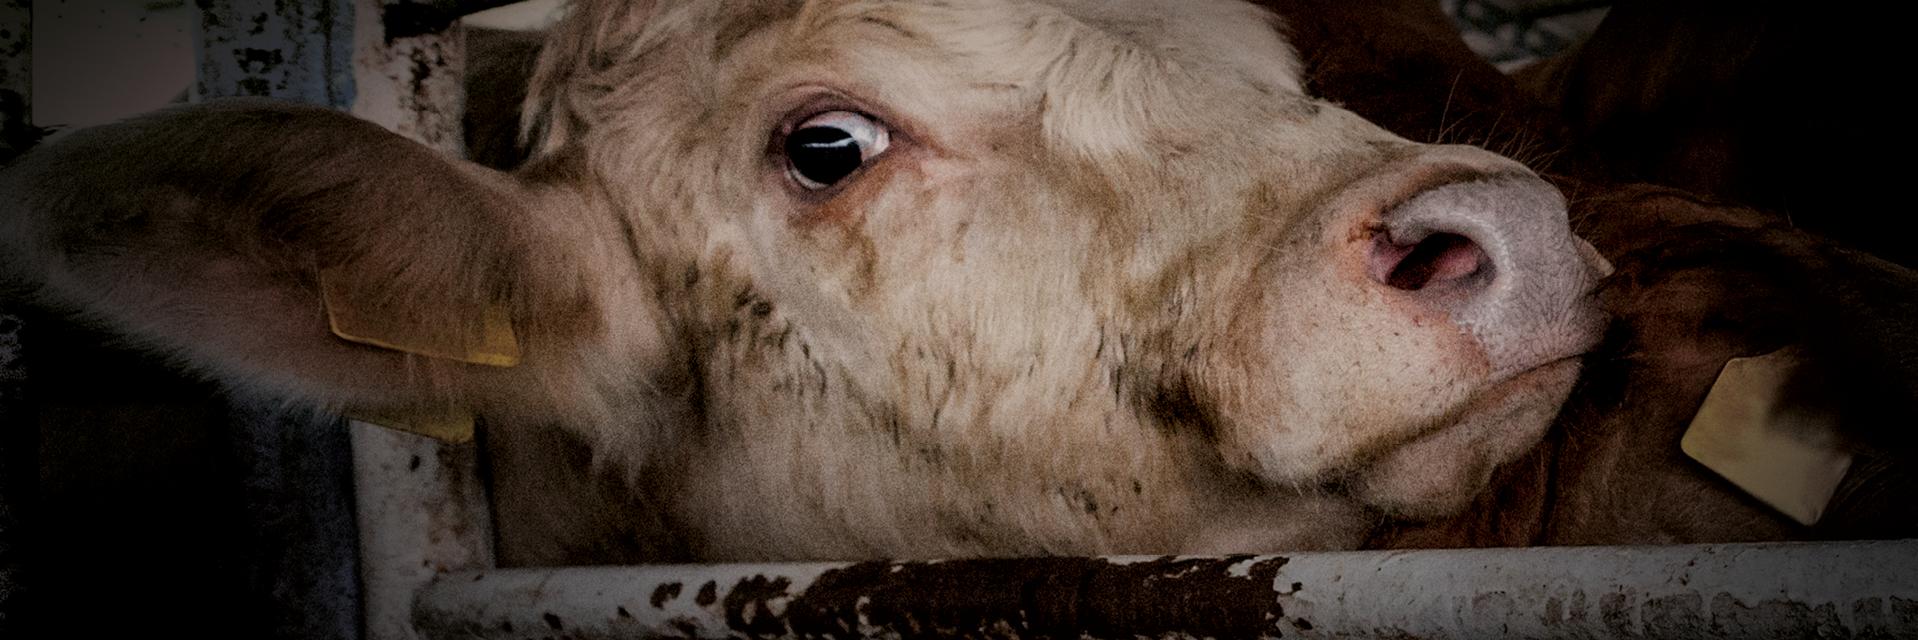 Kuh auf Tiertransport